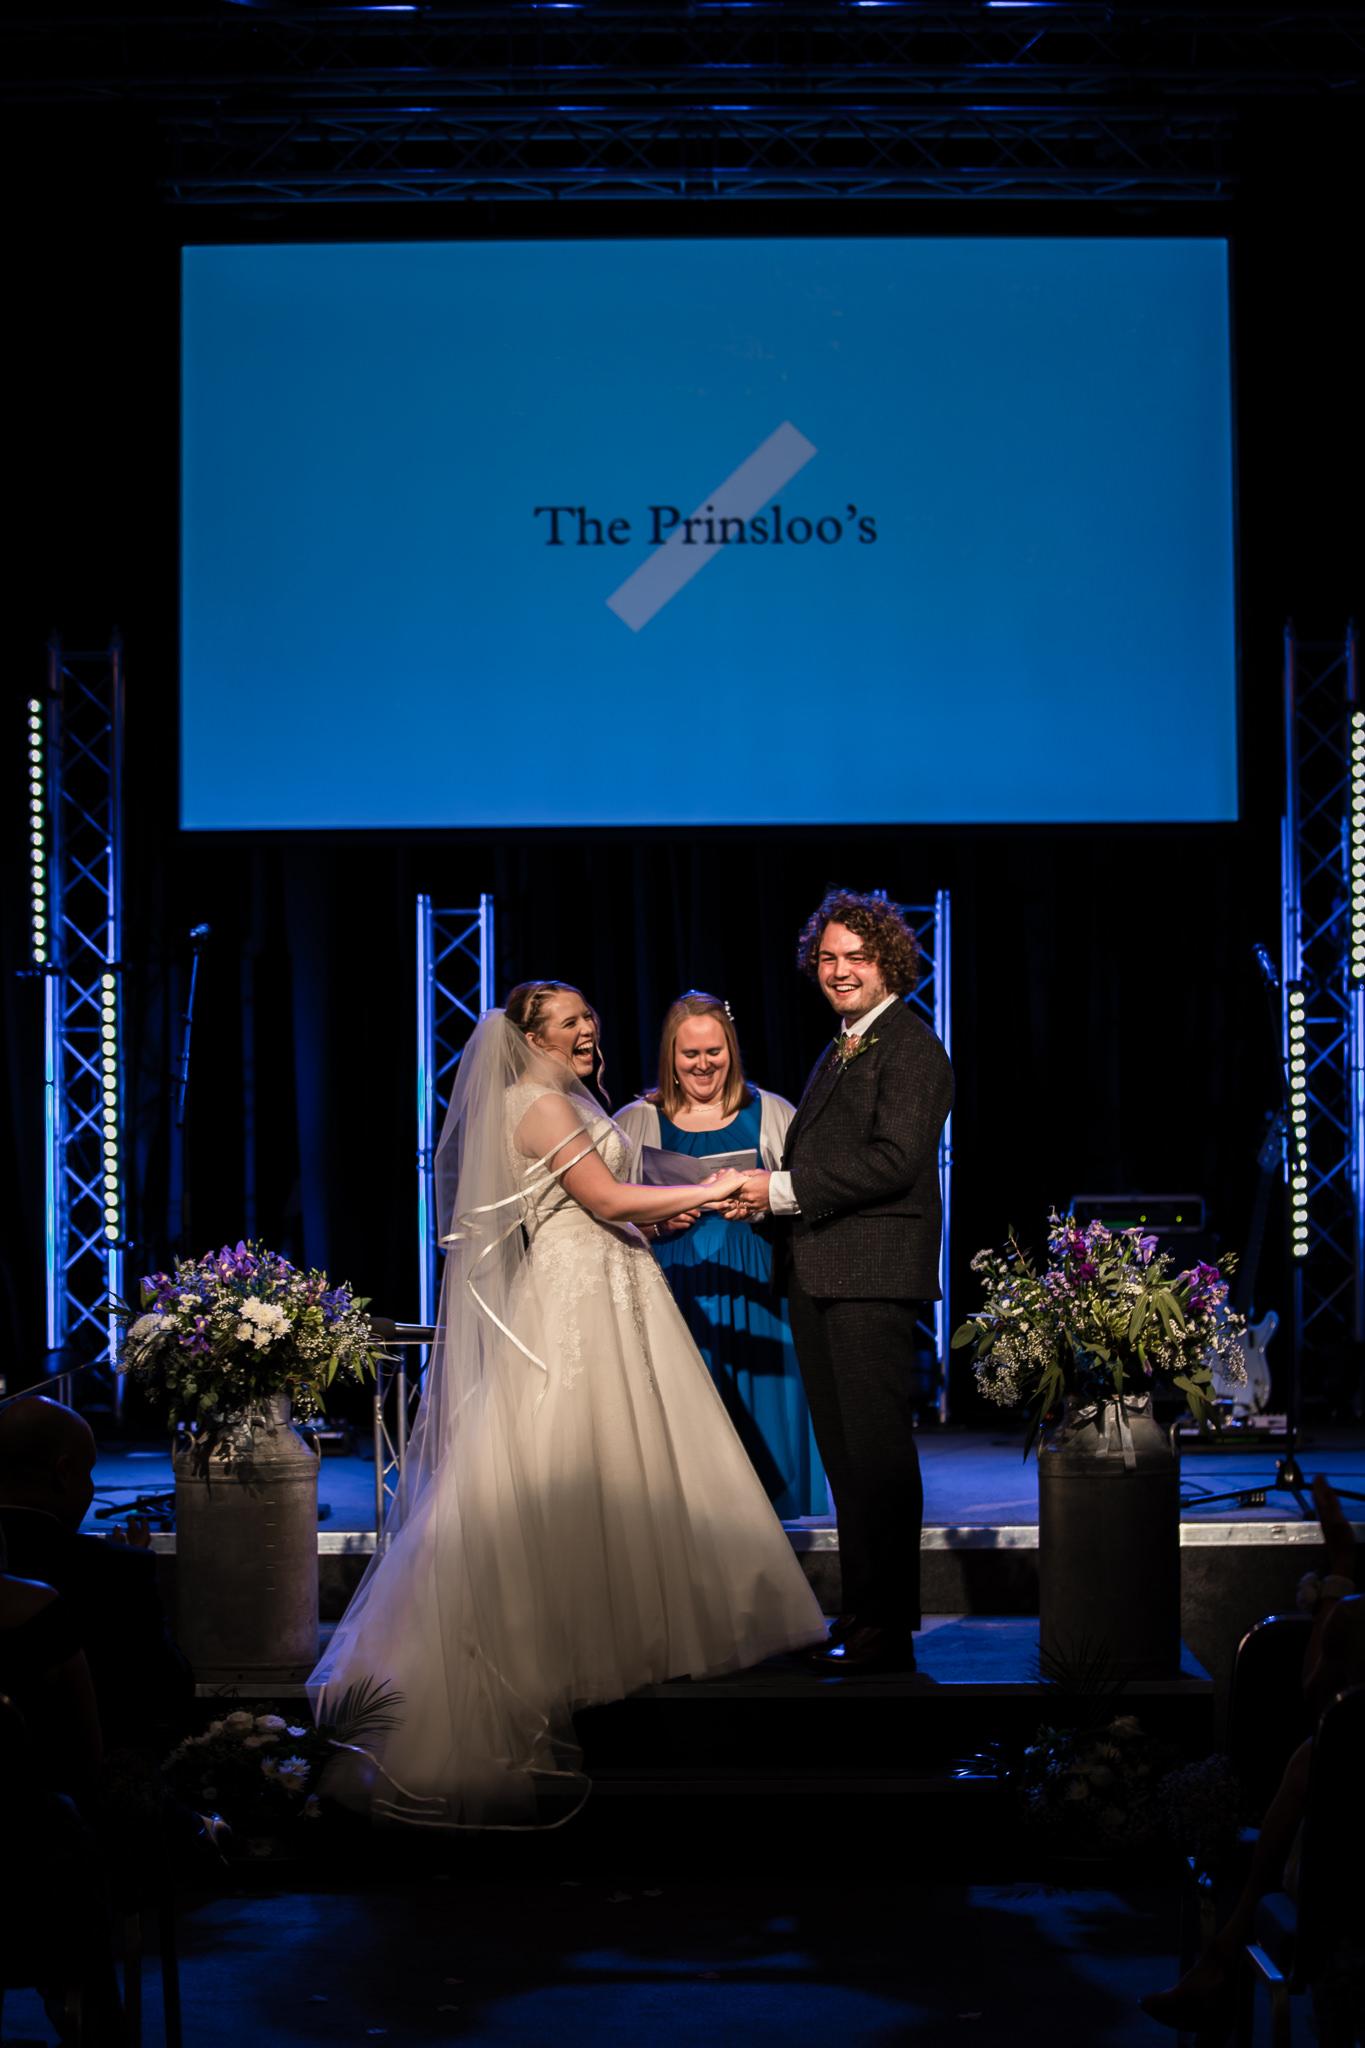 nottingham wedding26